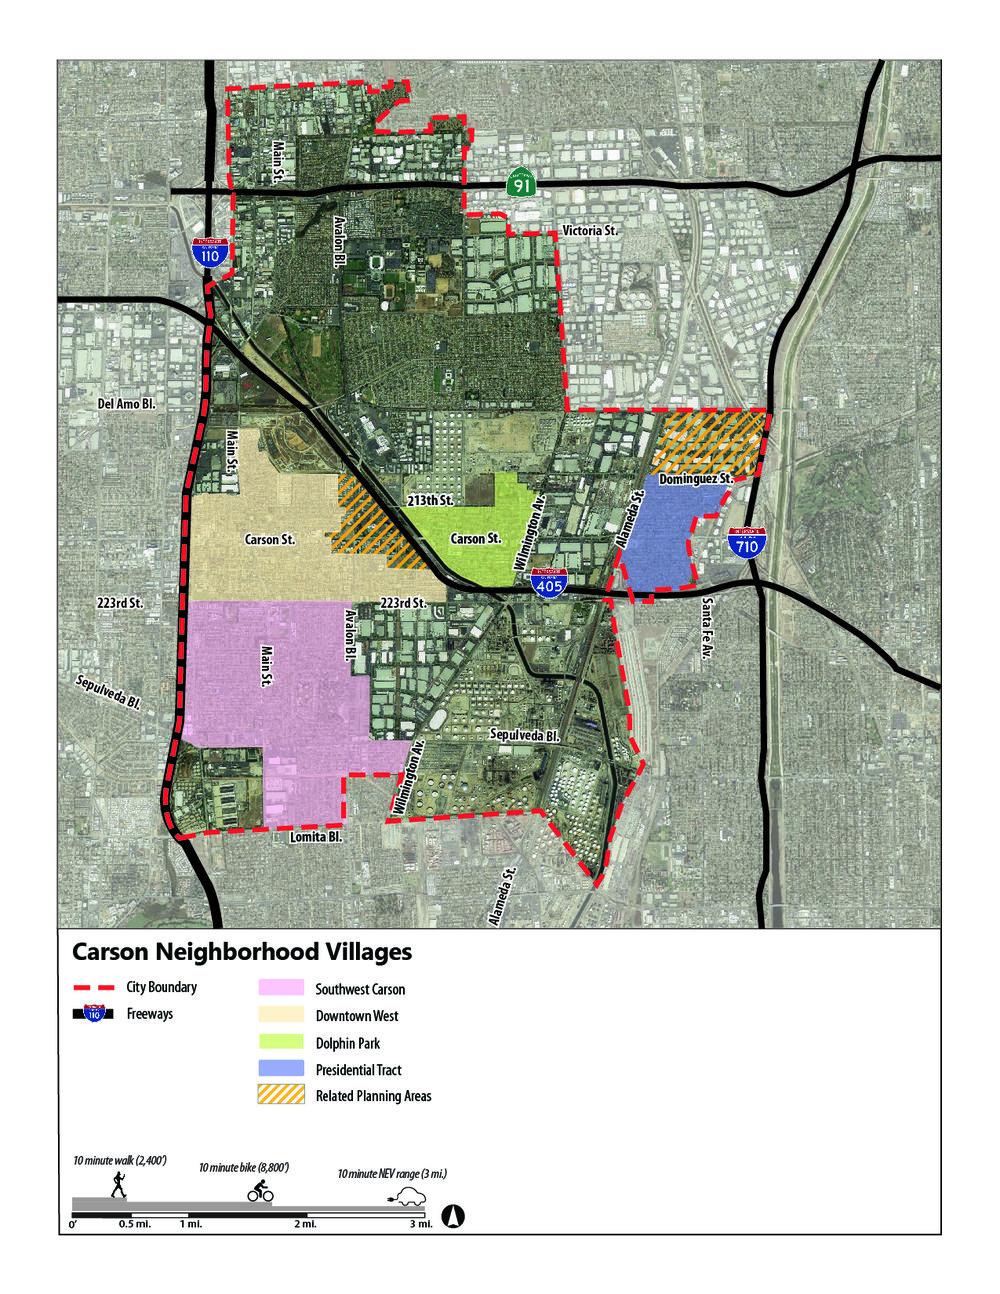 Carson Neighborhood Villages - Citywide-01.jpg